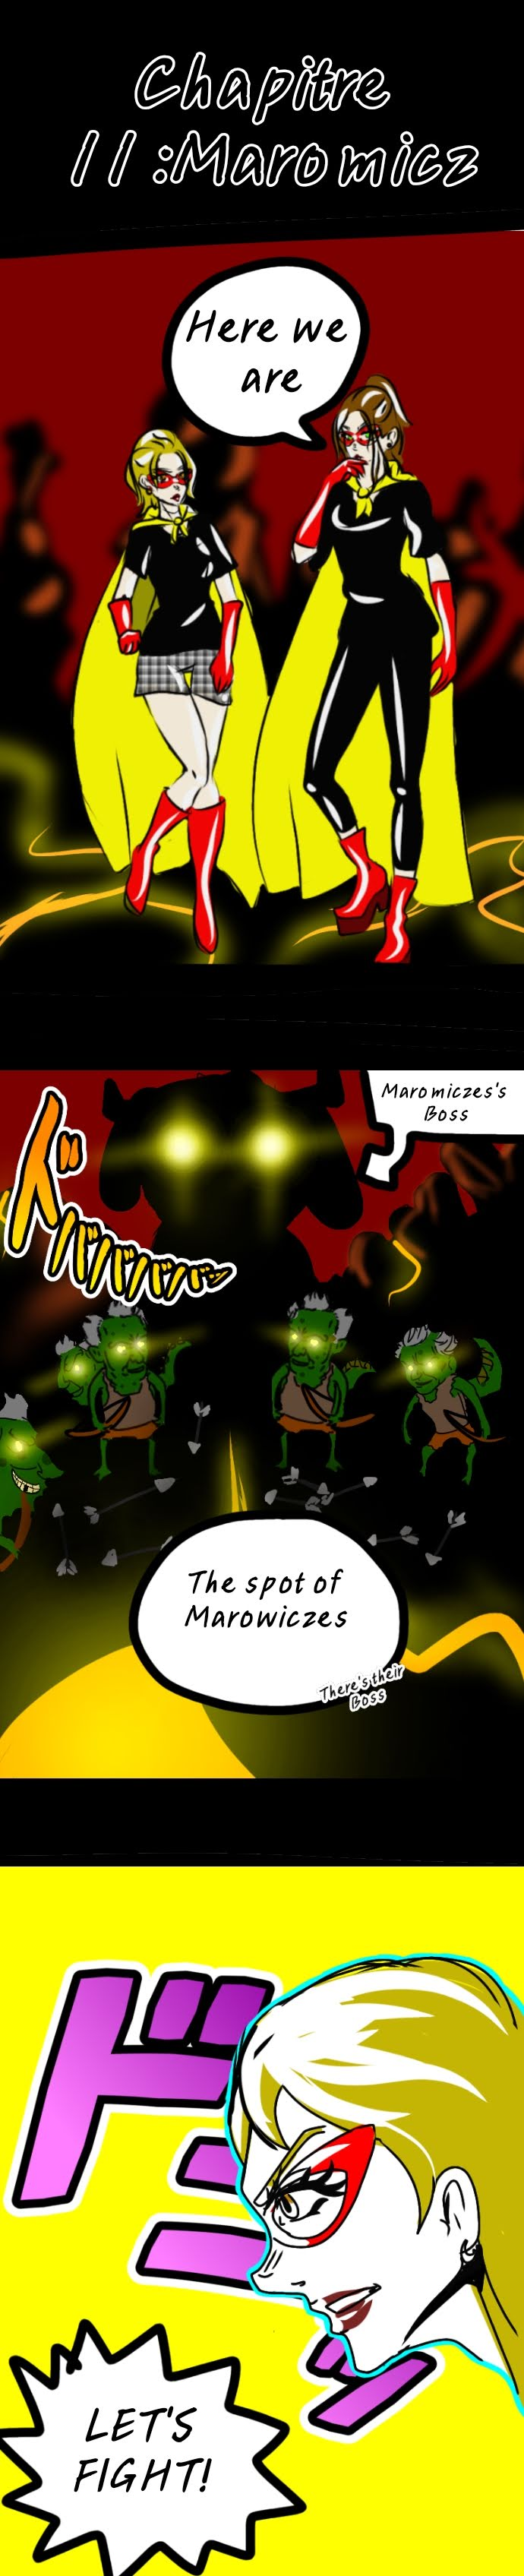 https://img2.nineanime.com/comics/pic3/23/38167/1491814/c6fd6c7e4da27ed17b8f3b14d35aaeb6.jpg Page 1